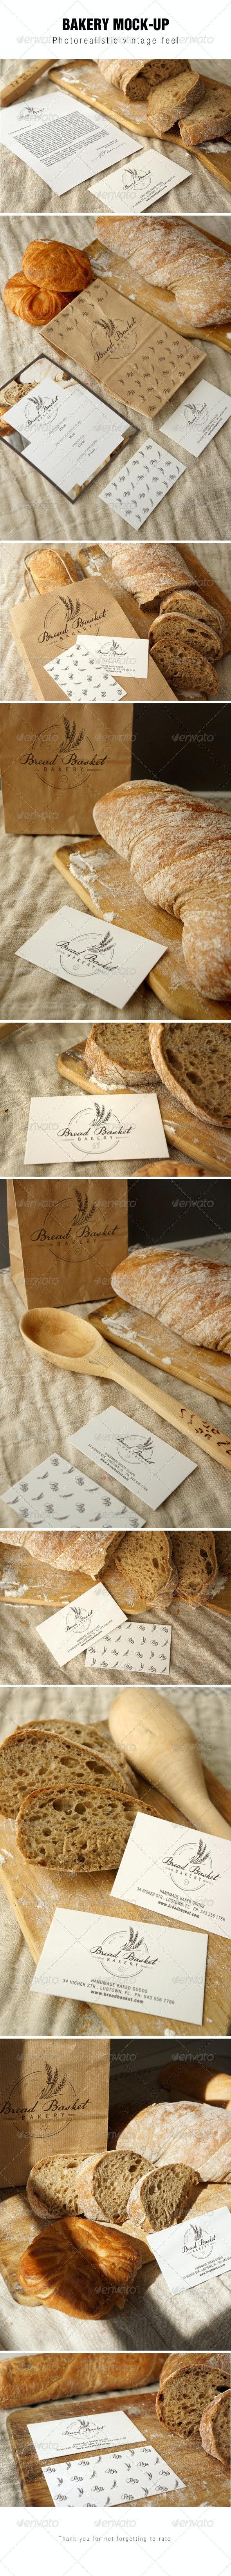 Bakery Branding Mockup - Stationery Print